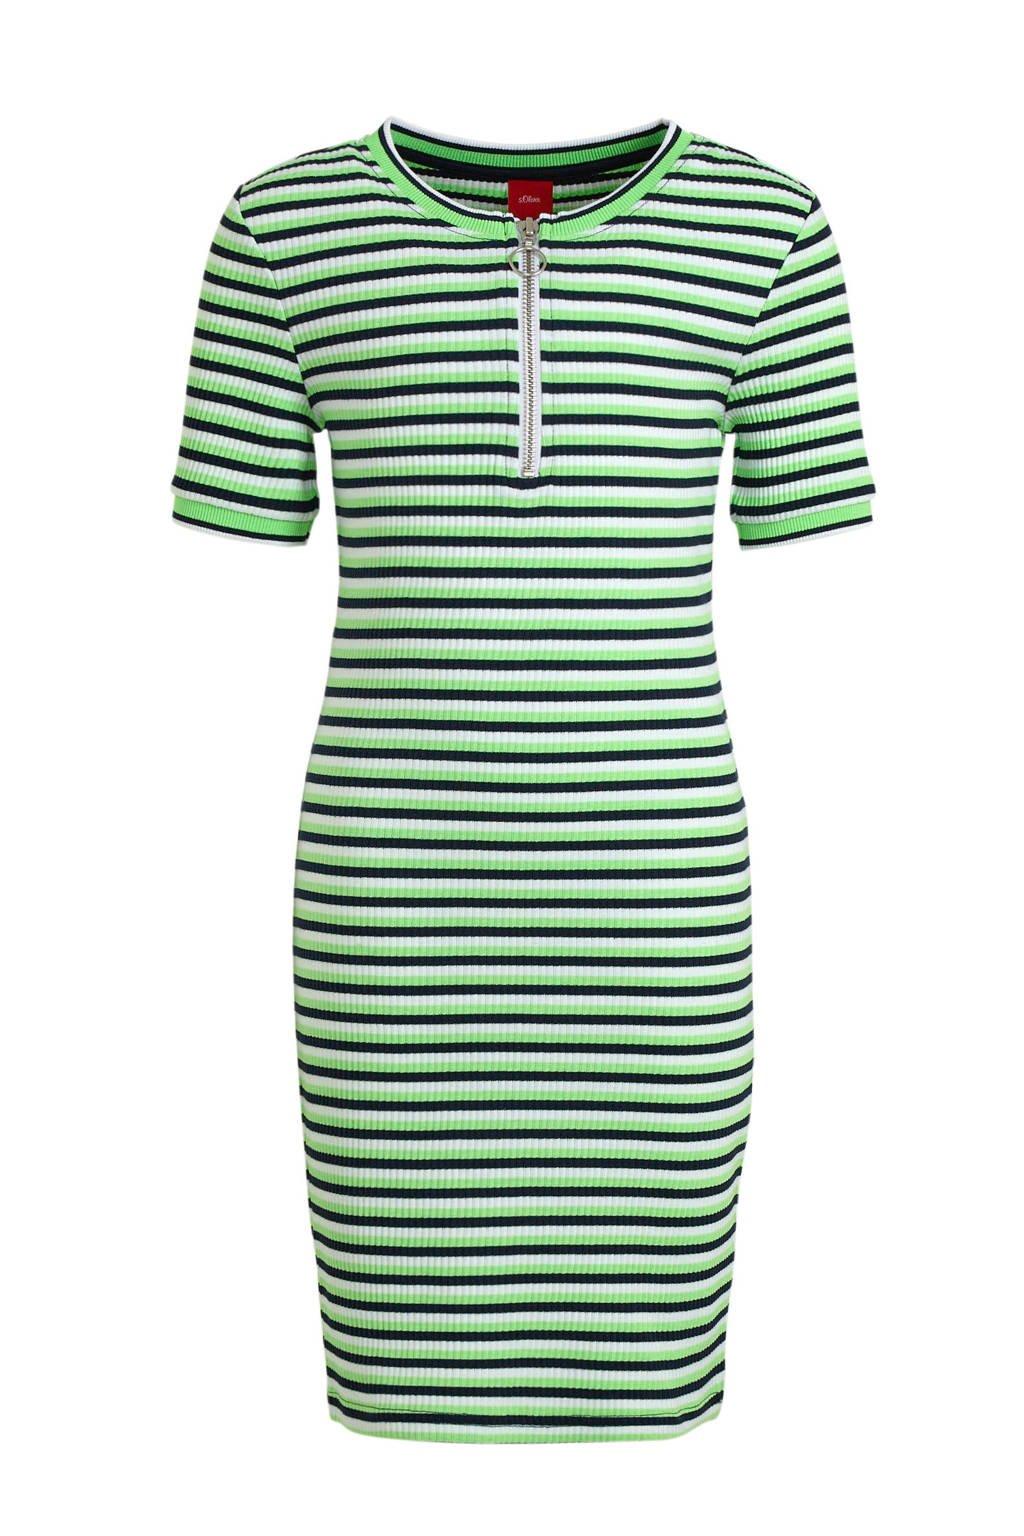 s.Oliver gestreepte ribgebreide jersey jurk lichtgroen/donkerblauw/wit, Lichtgroen/donkerblauw/wit